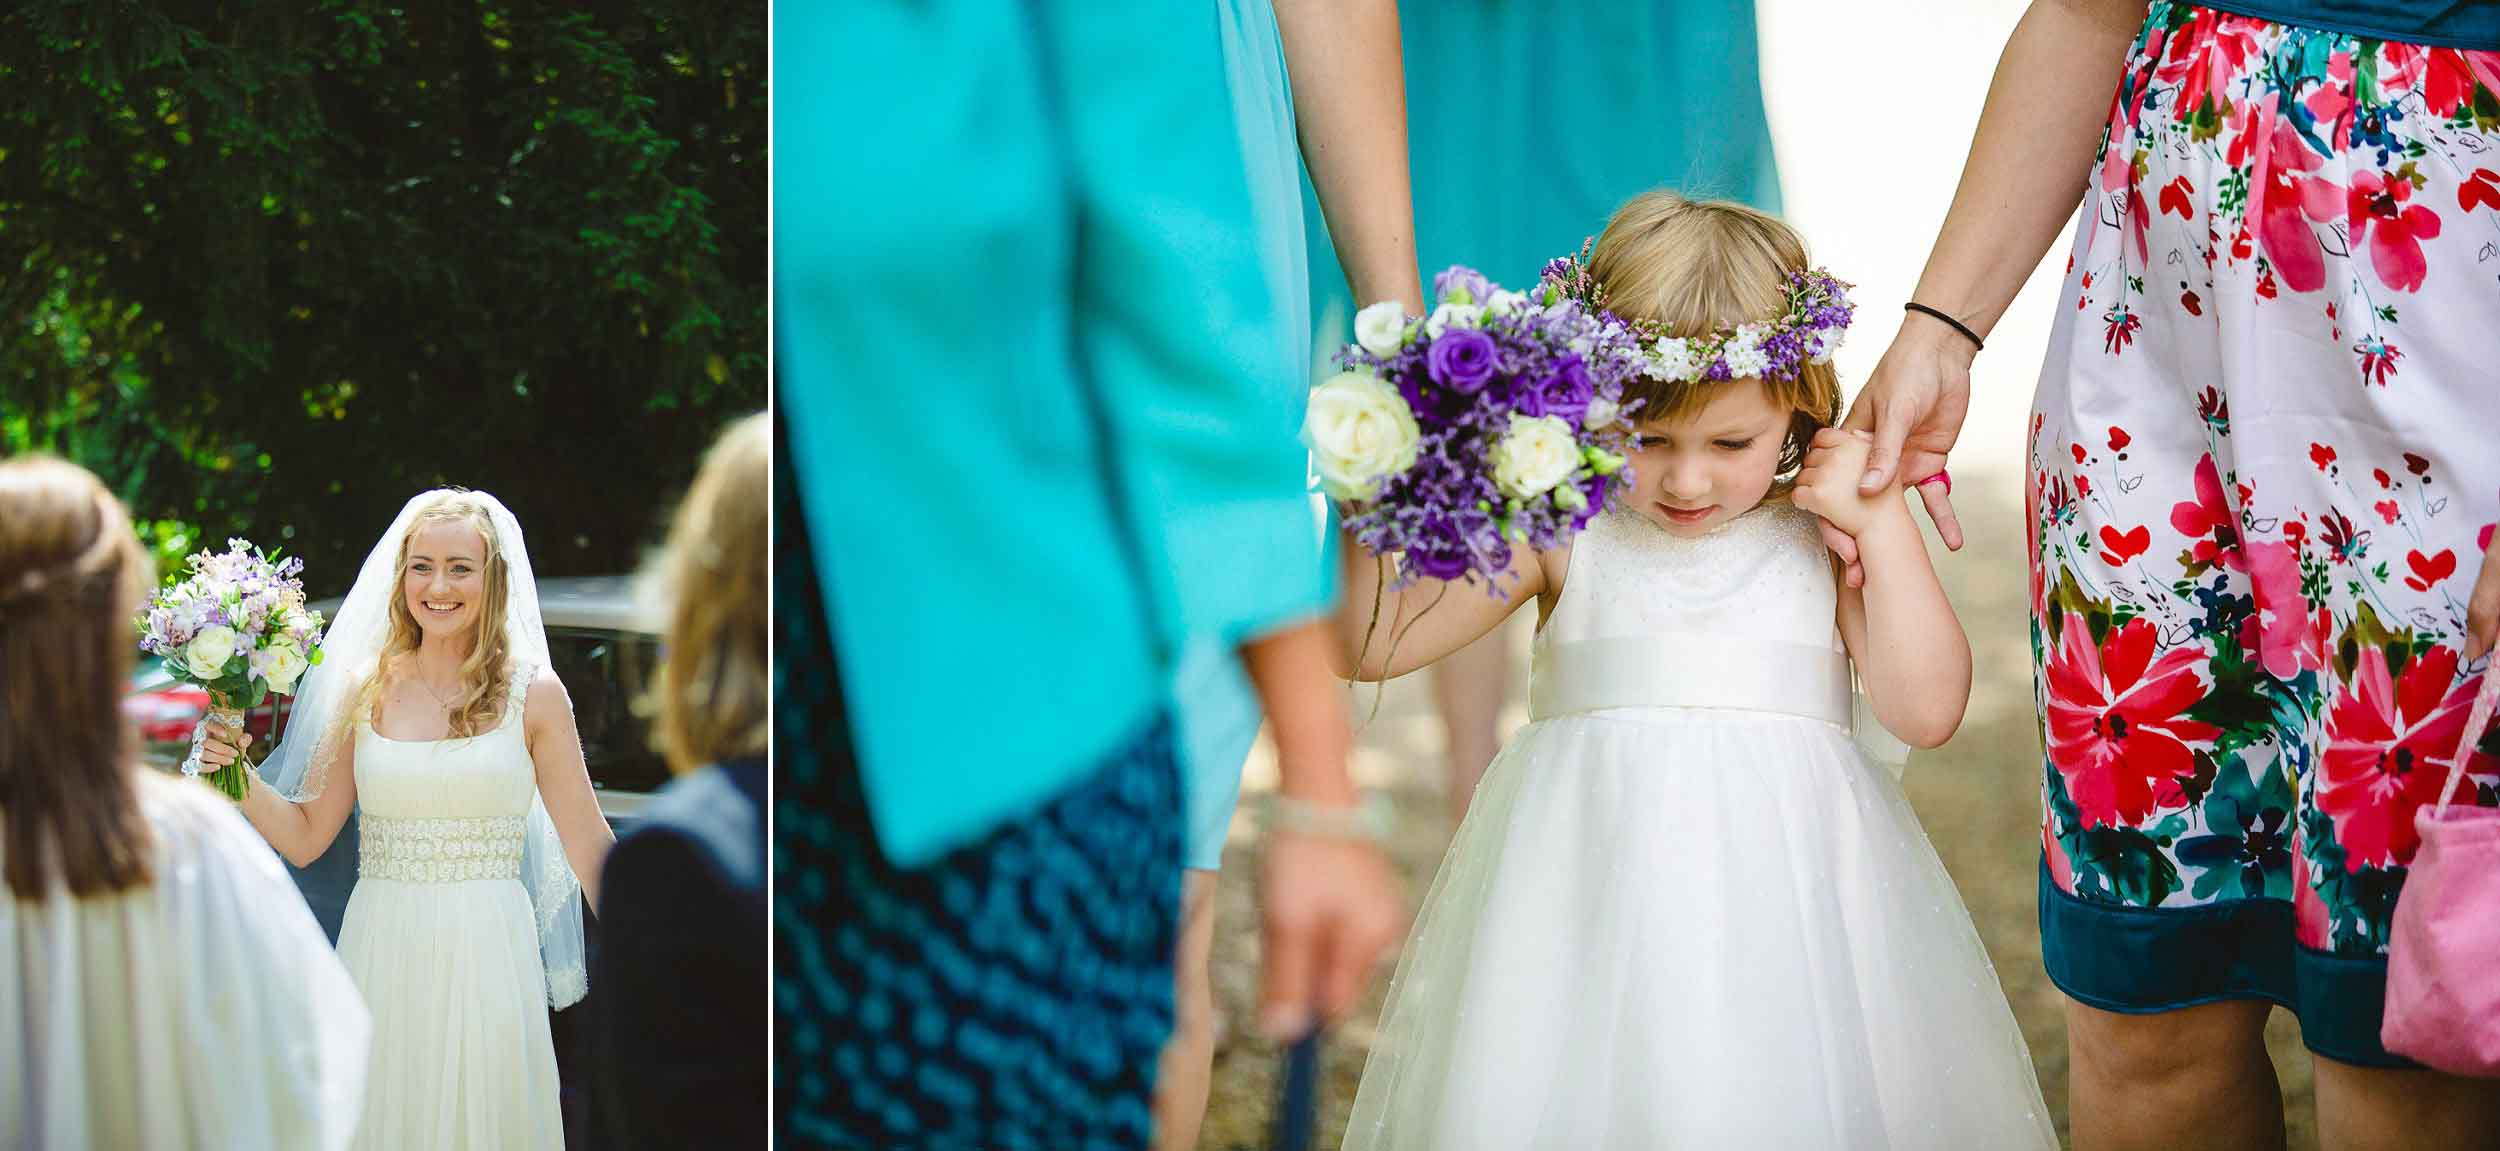 Marks-Hall-Wedding-Photographer-26.jpg